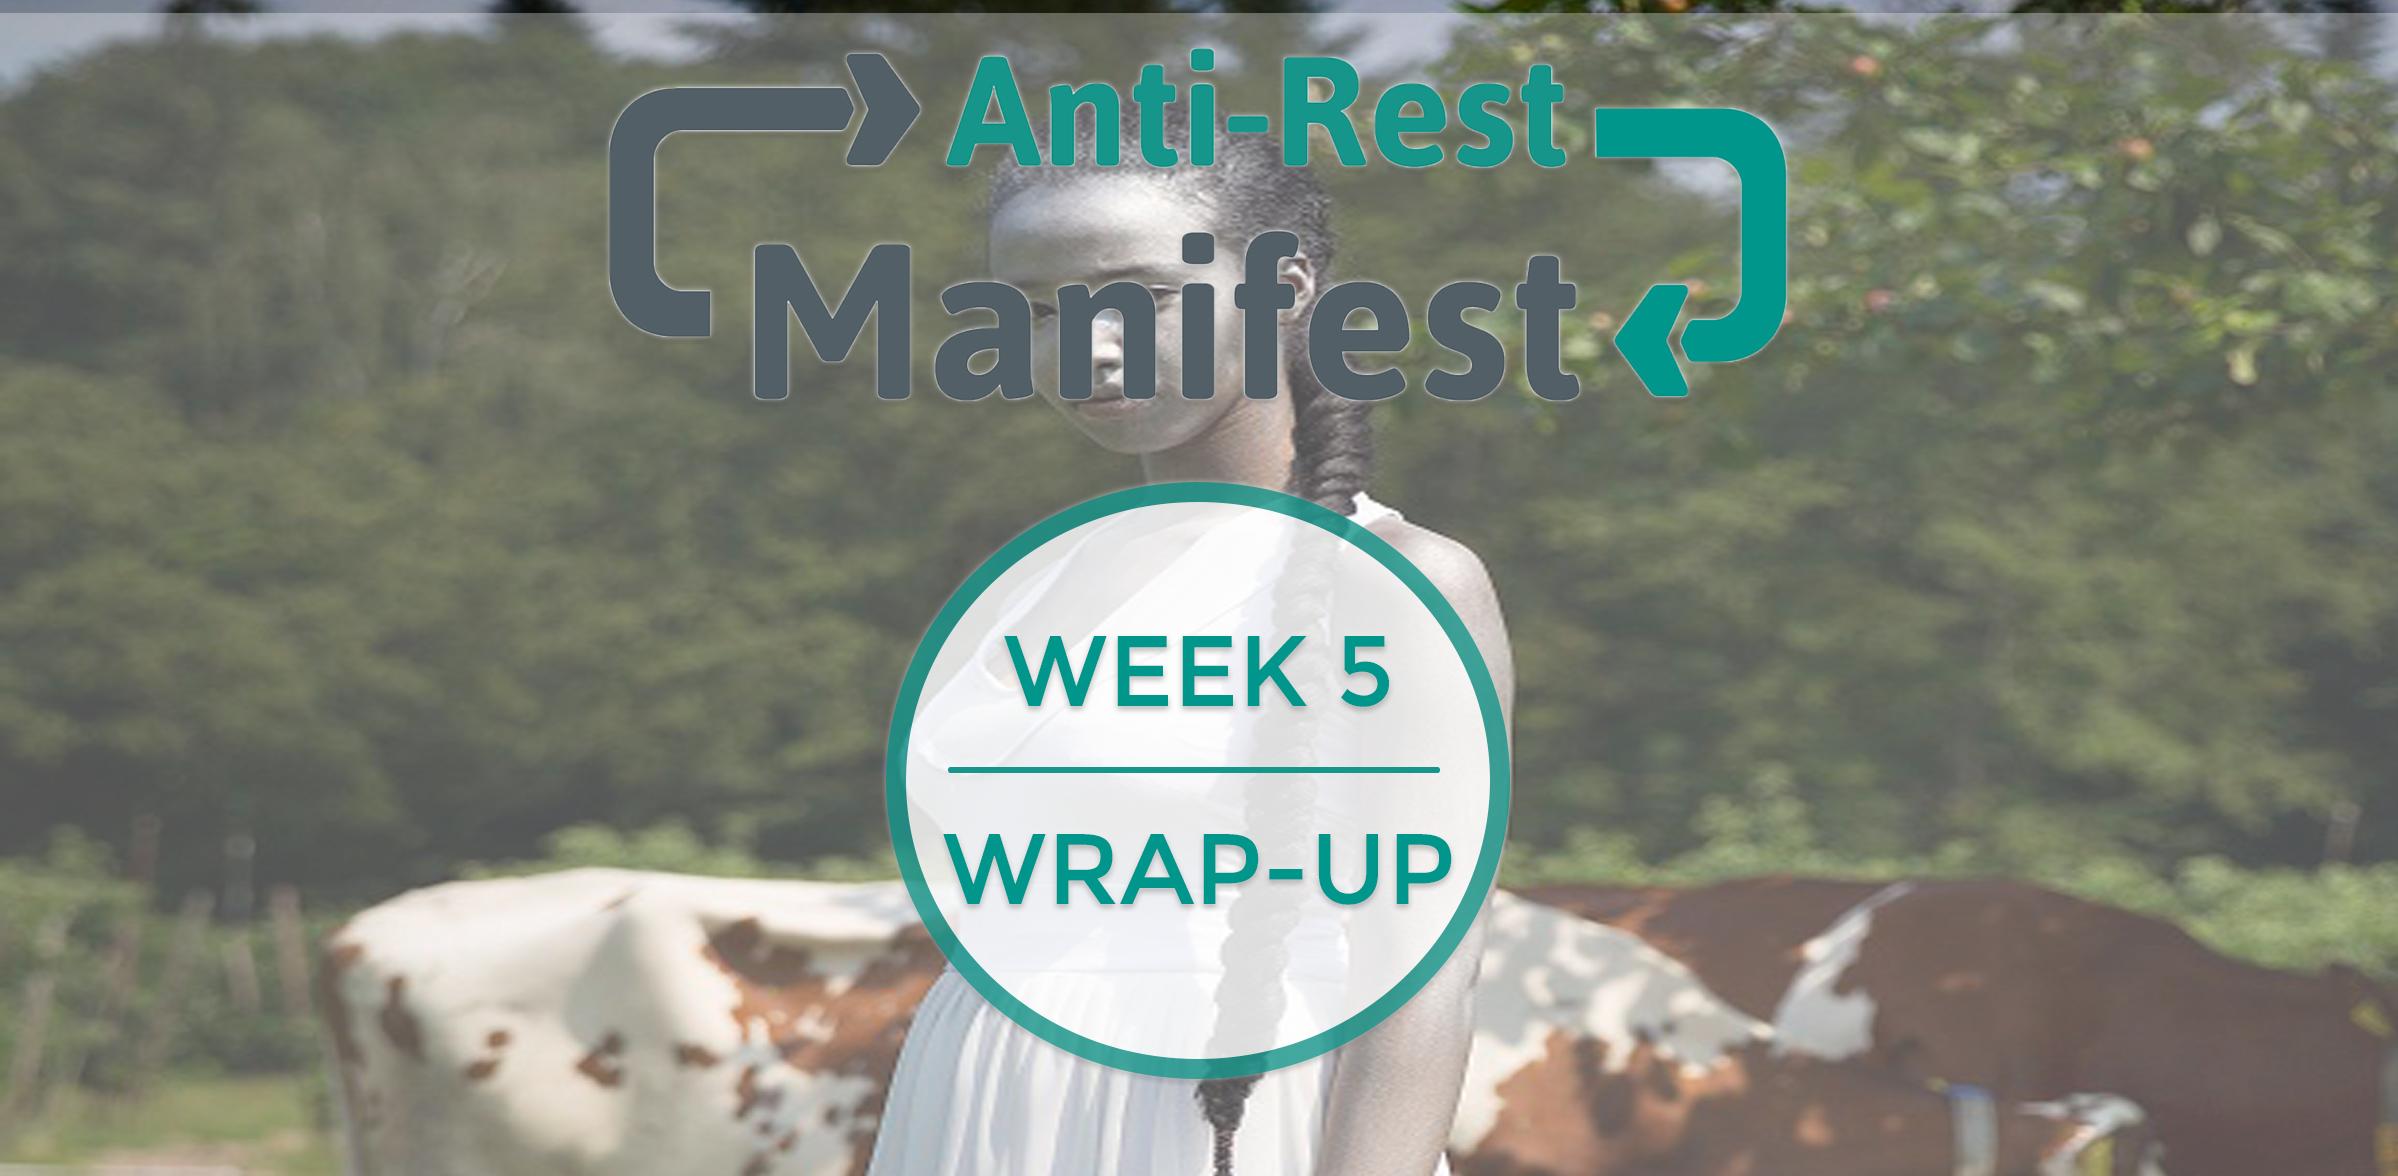 Anti-rest manifest